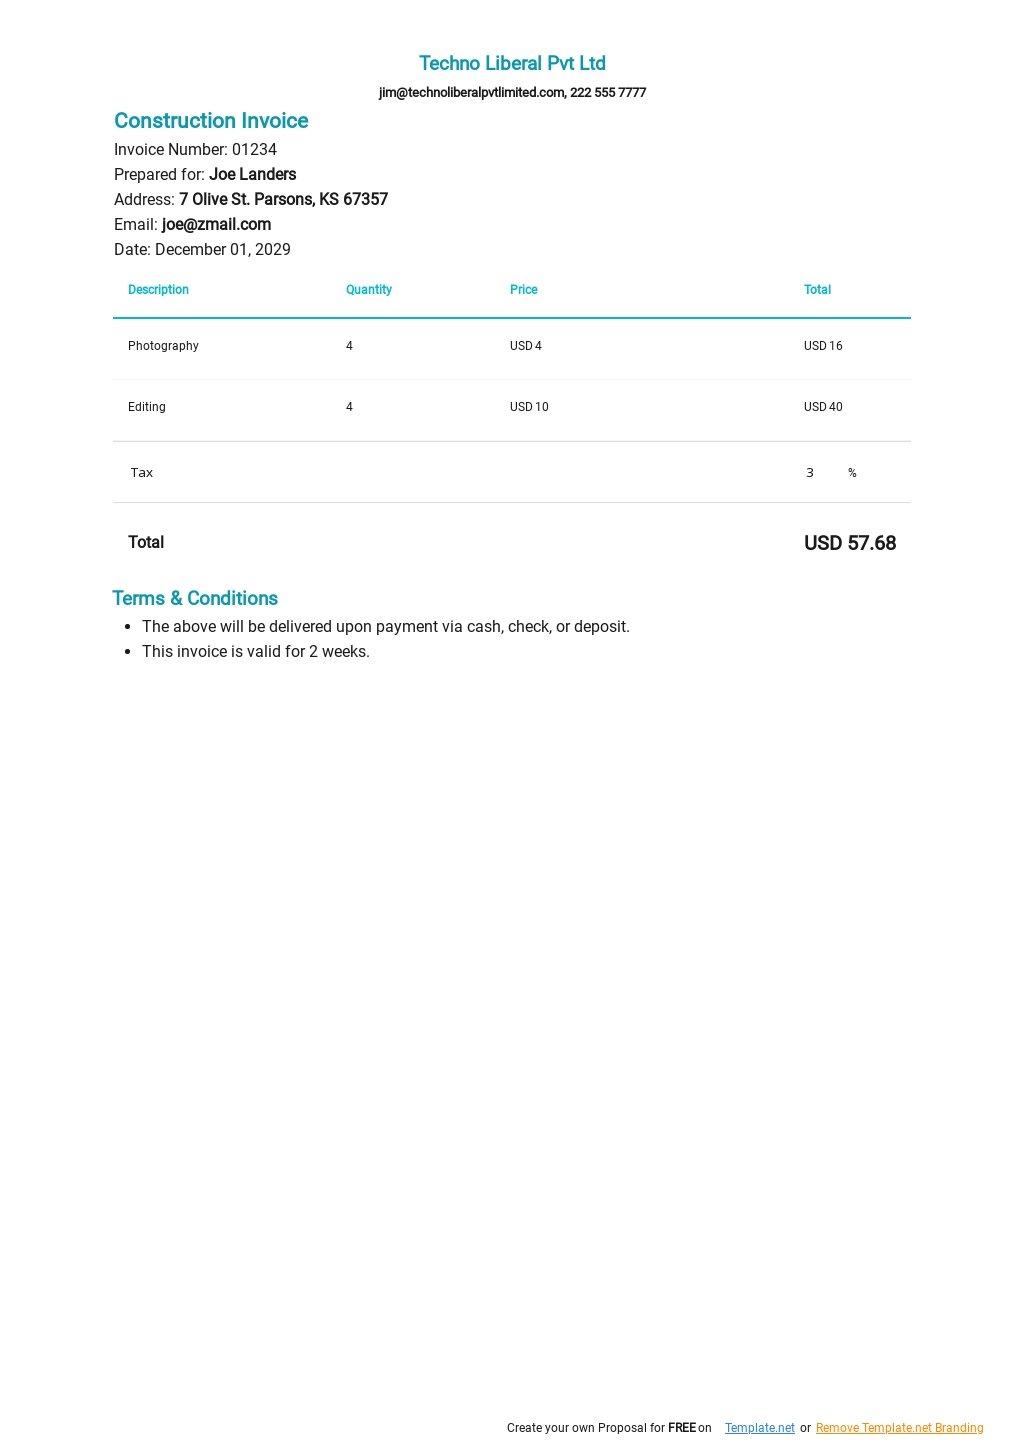 Self Employment Contractor Invoice Template.jpe